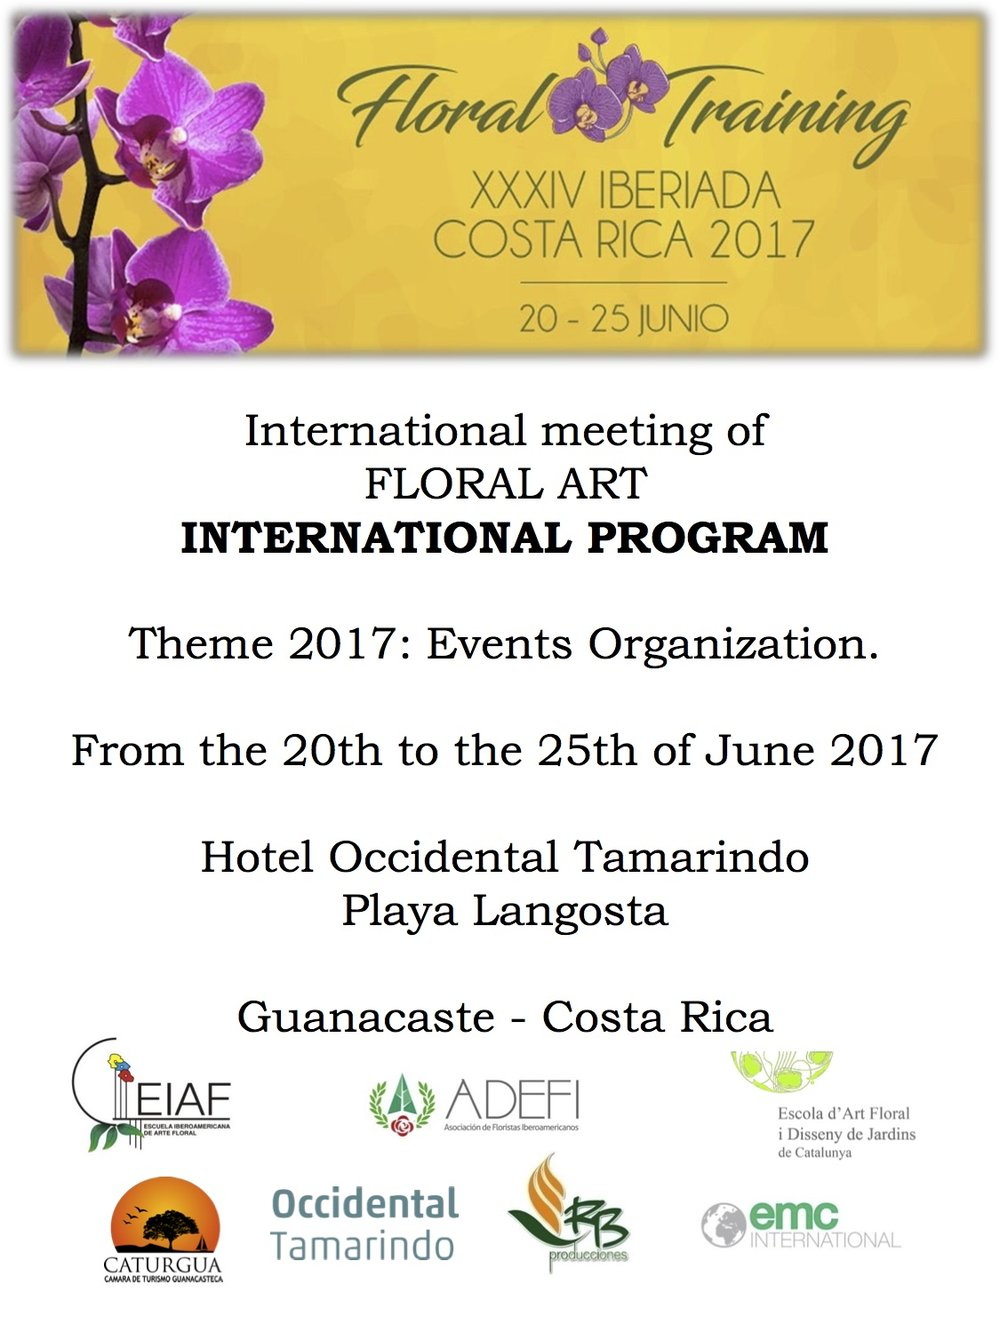 Floral Training - XXXIV Iberiada Costa Rica 2017 (English).jpg